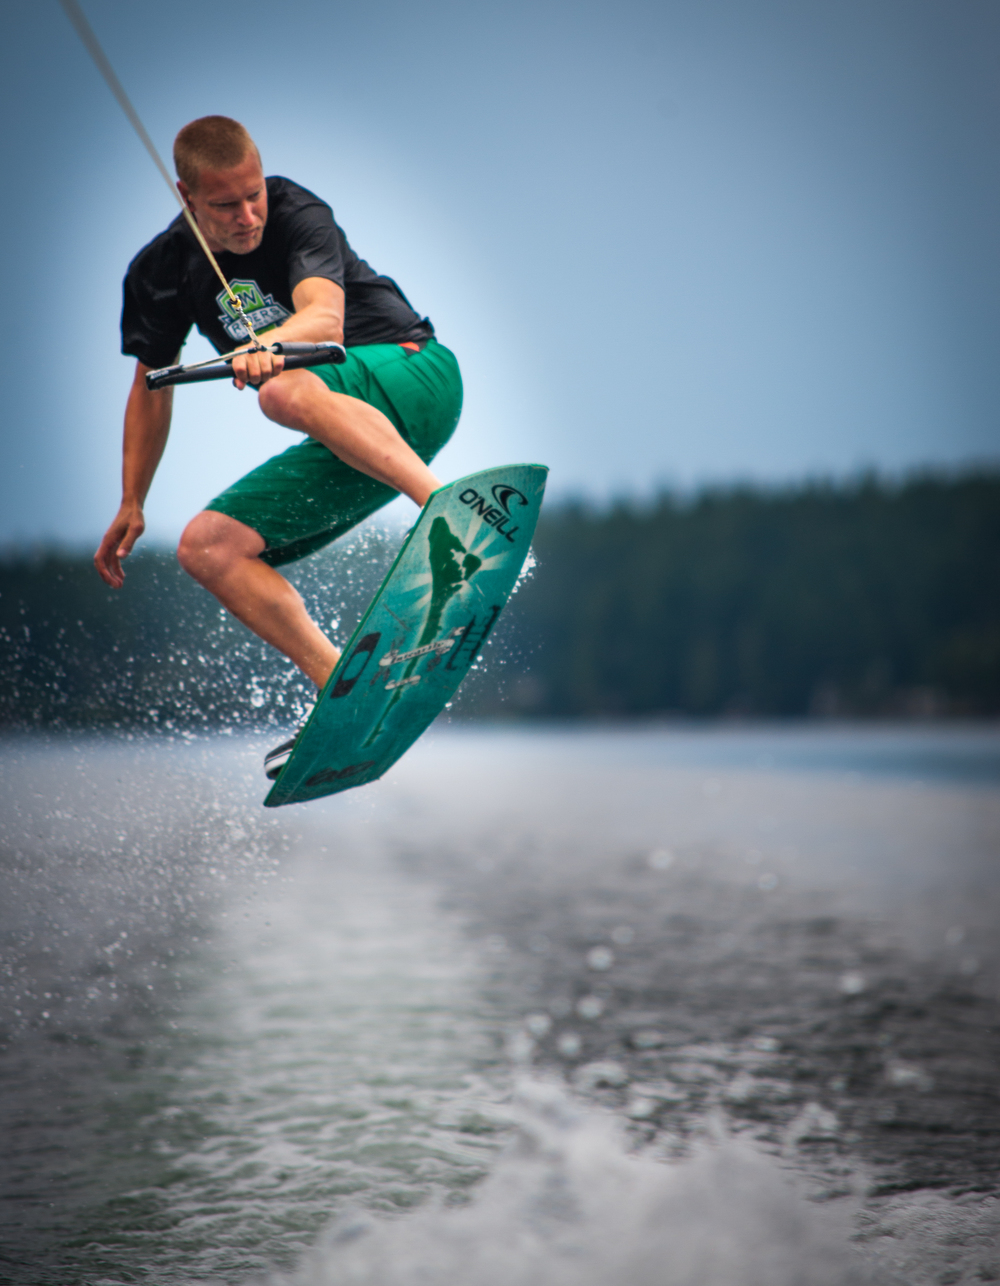 Mason Lake wakeskating with Aaron Huntley